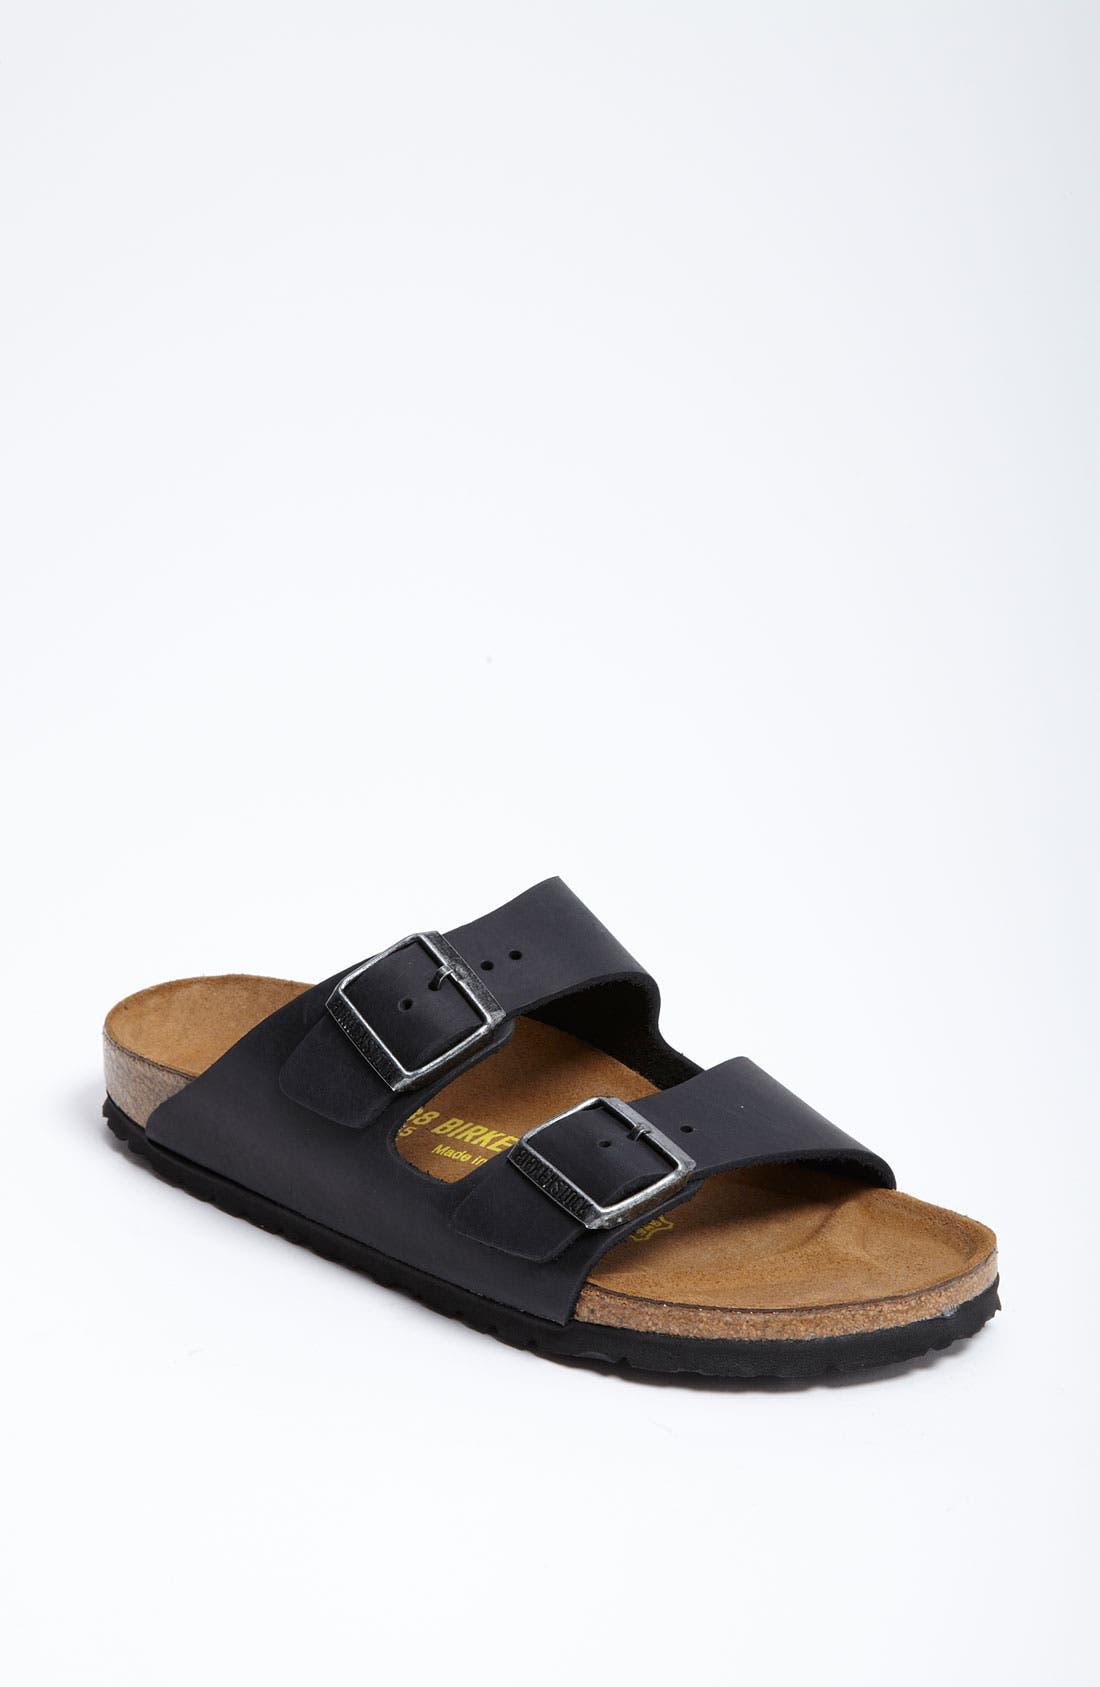 Alternate Image 1 Selected - Birkenstock 'Arizona' Sandal (Women)